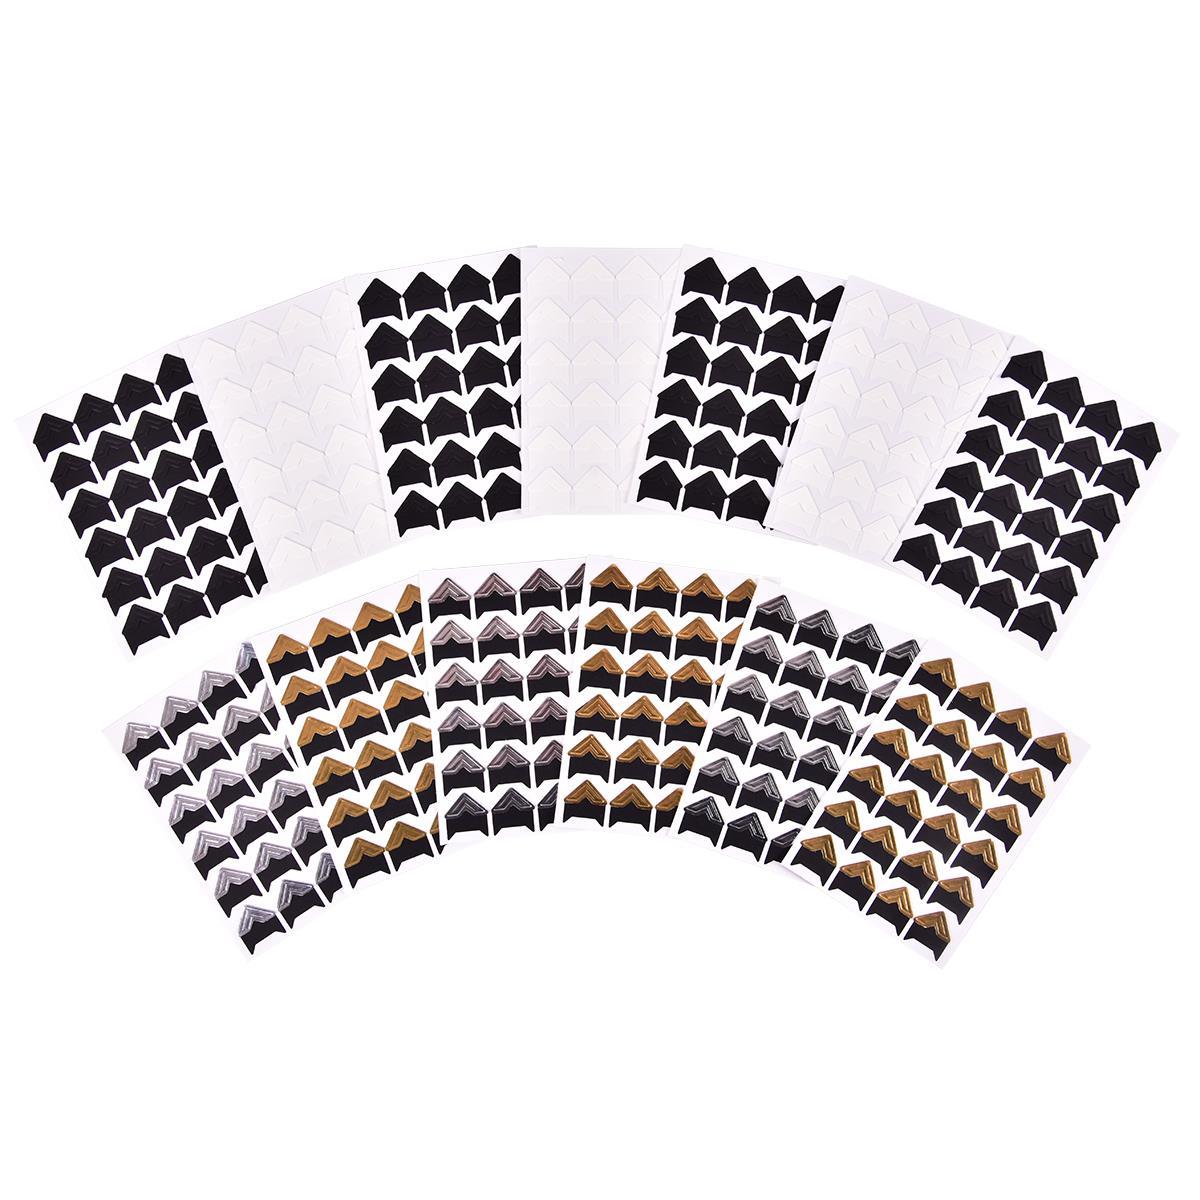 24 Pcs//Sheet HAN SHENG 25 Sheets Self-Adhesive Photo Mounting Corners Photo Corners Stickers for DIY Scrapbooking Picture Album Personal Journal